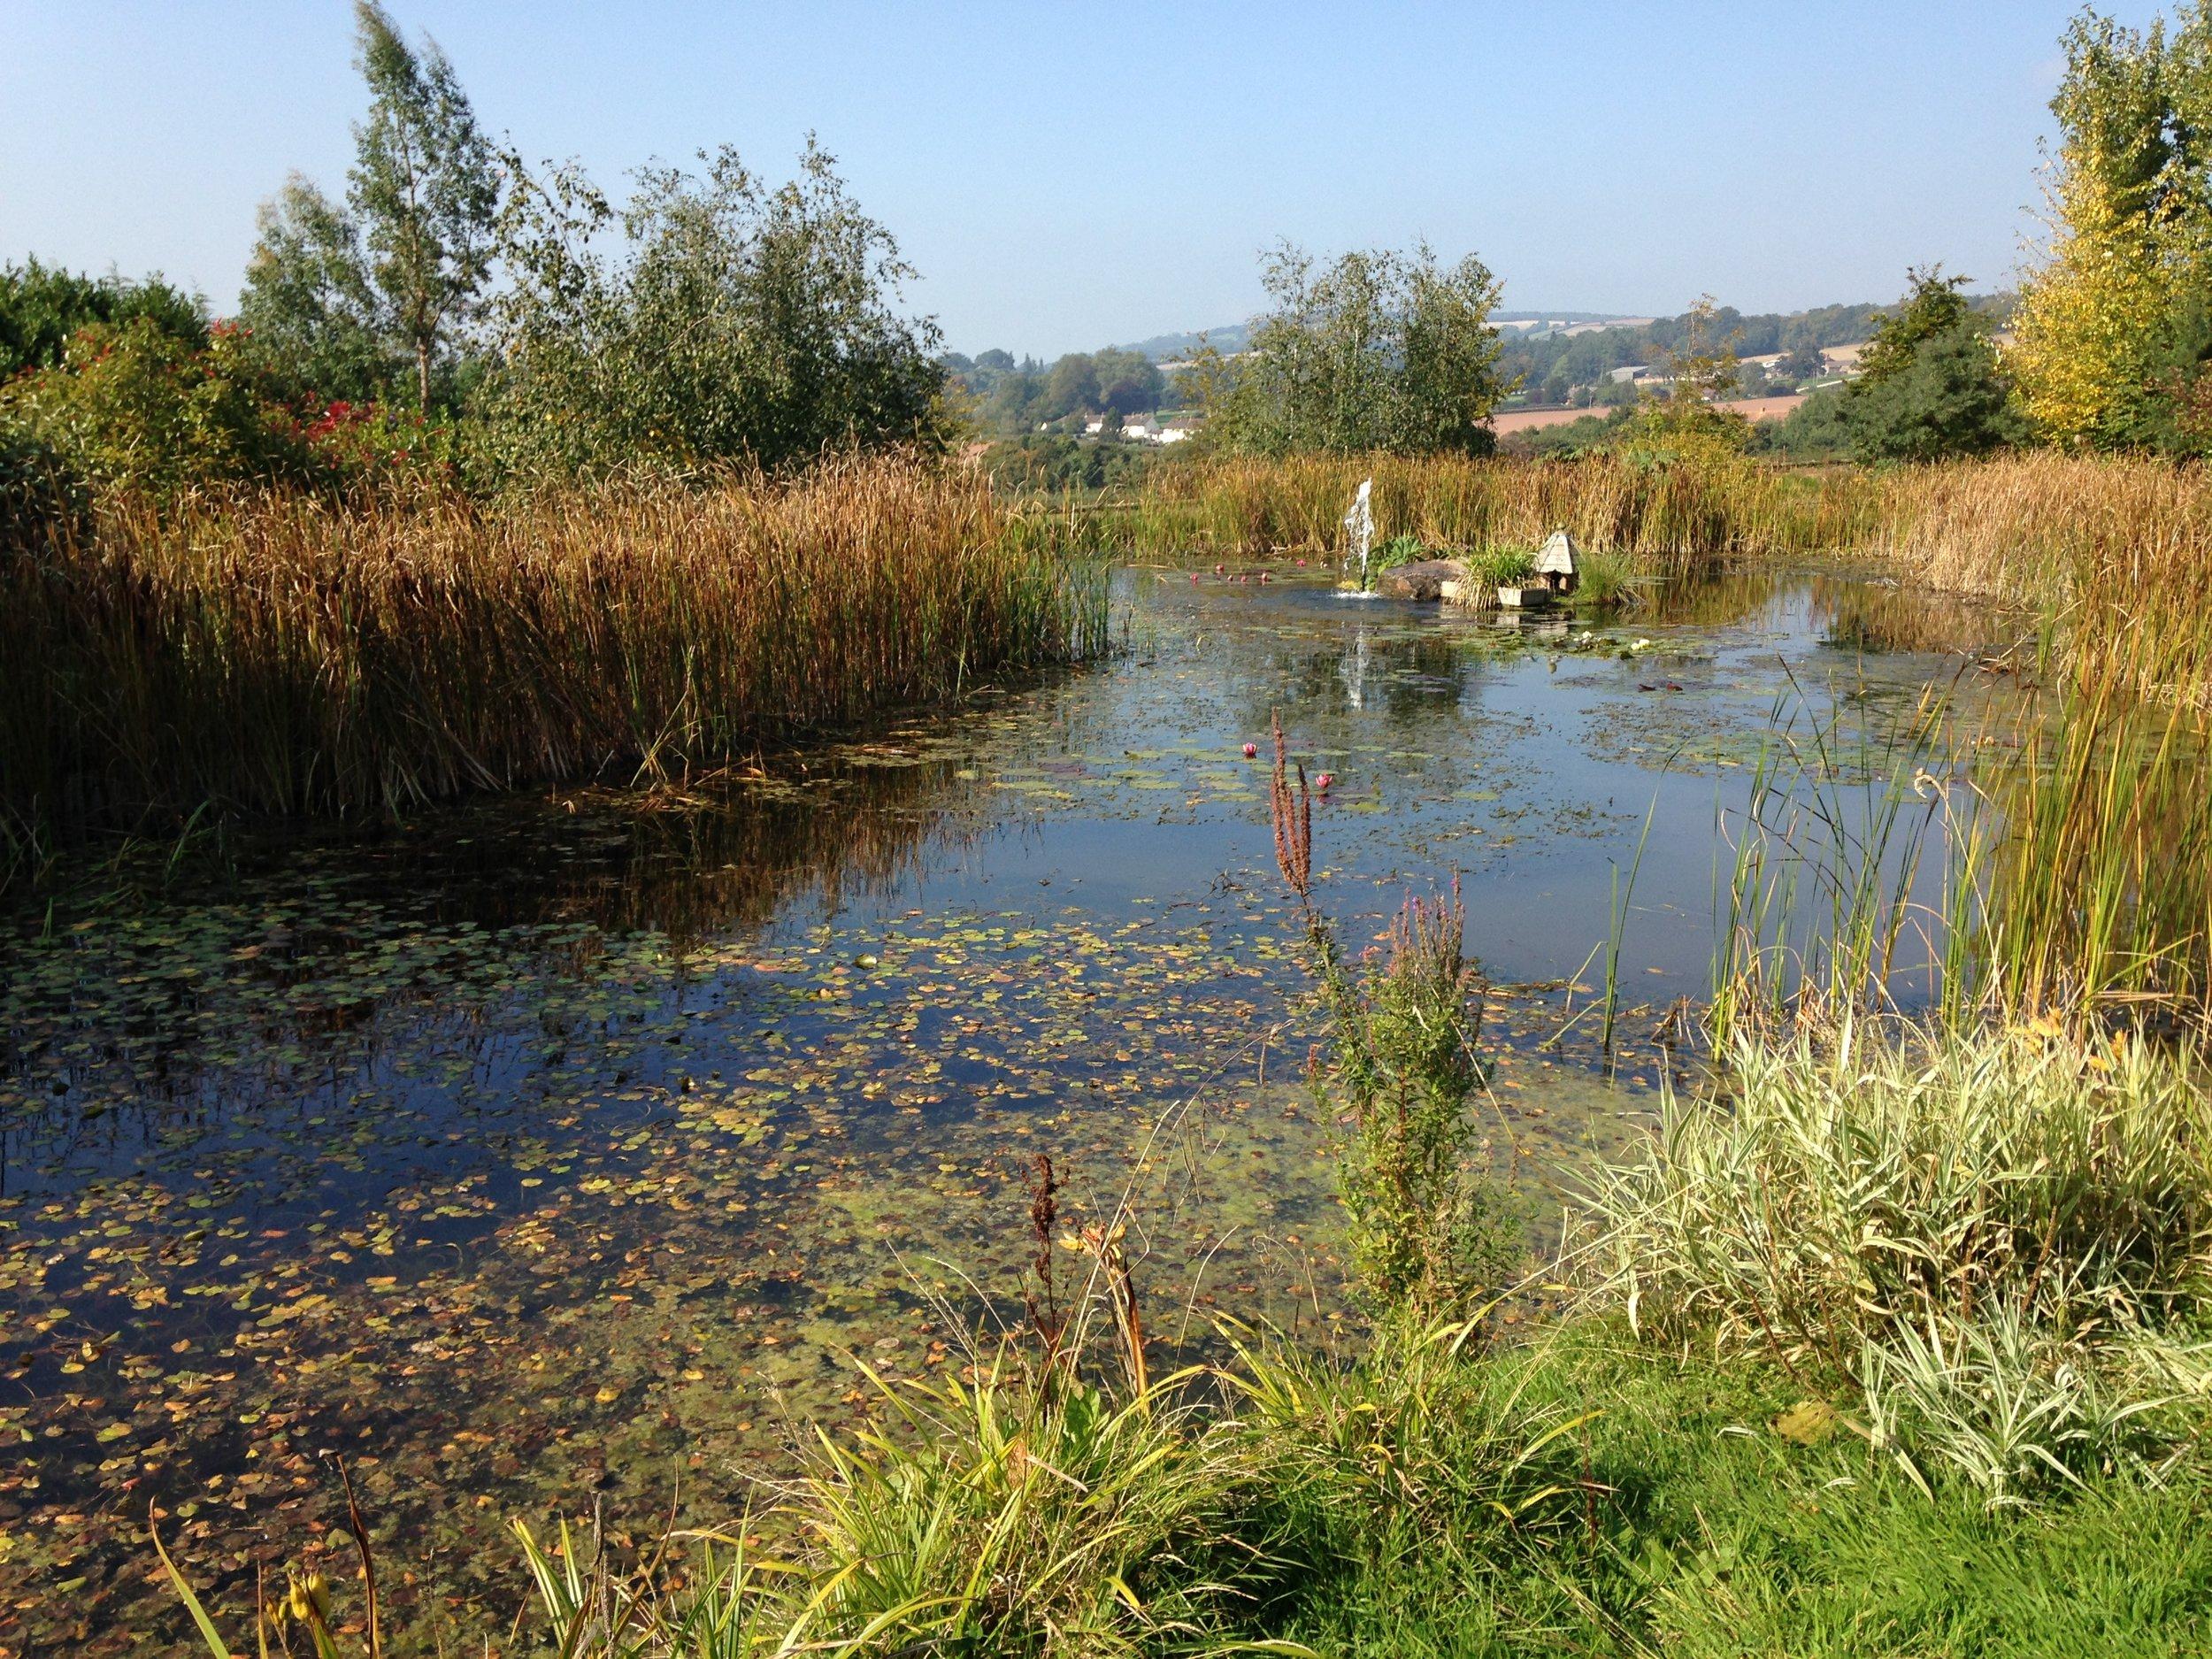 Aquatic vegetation; starting to take over